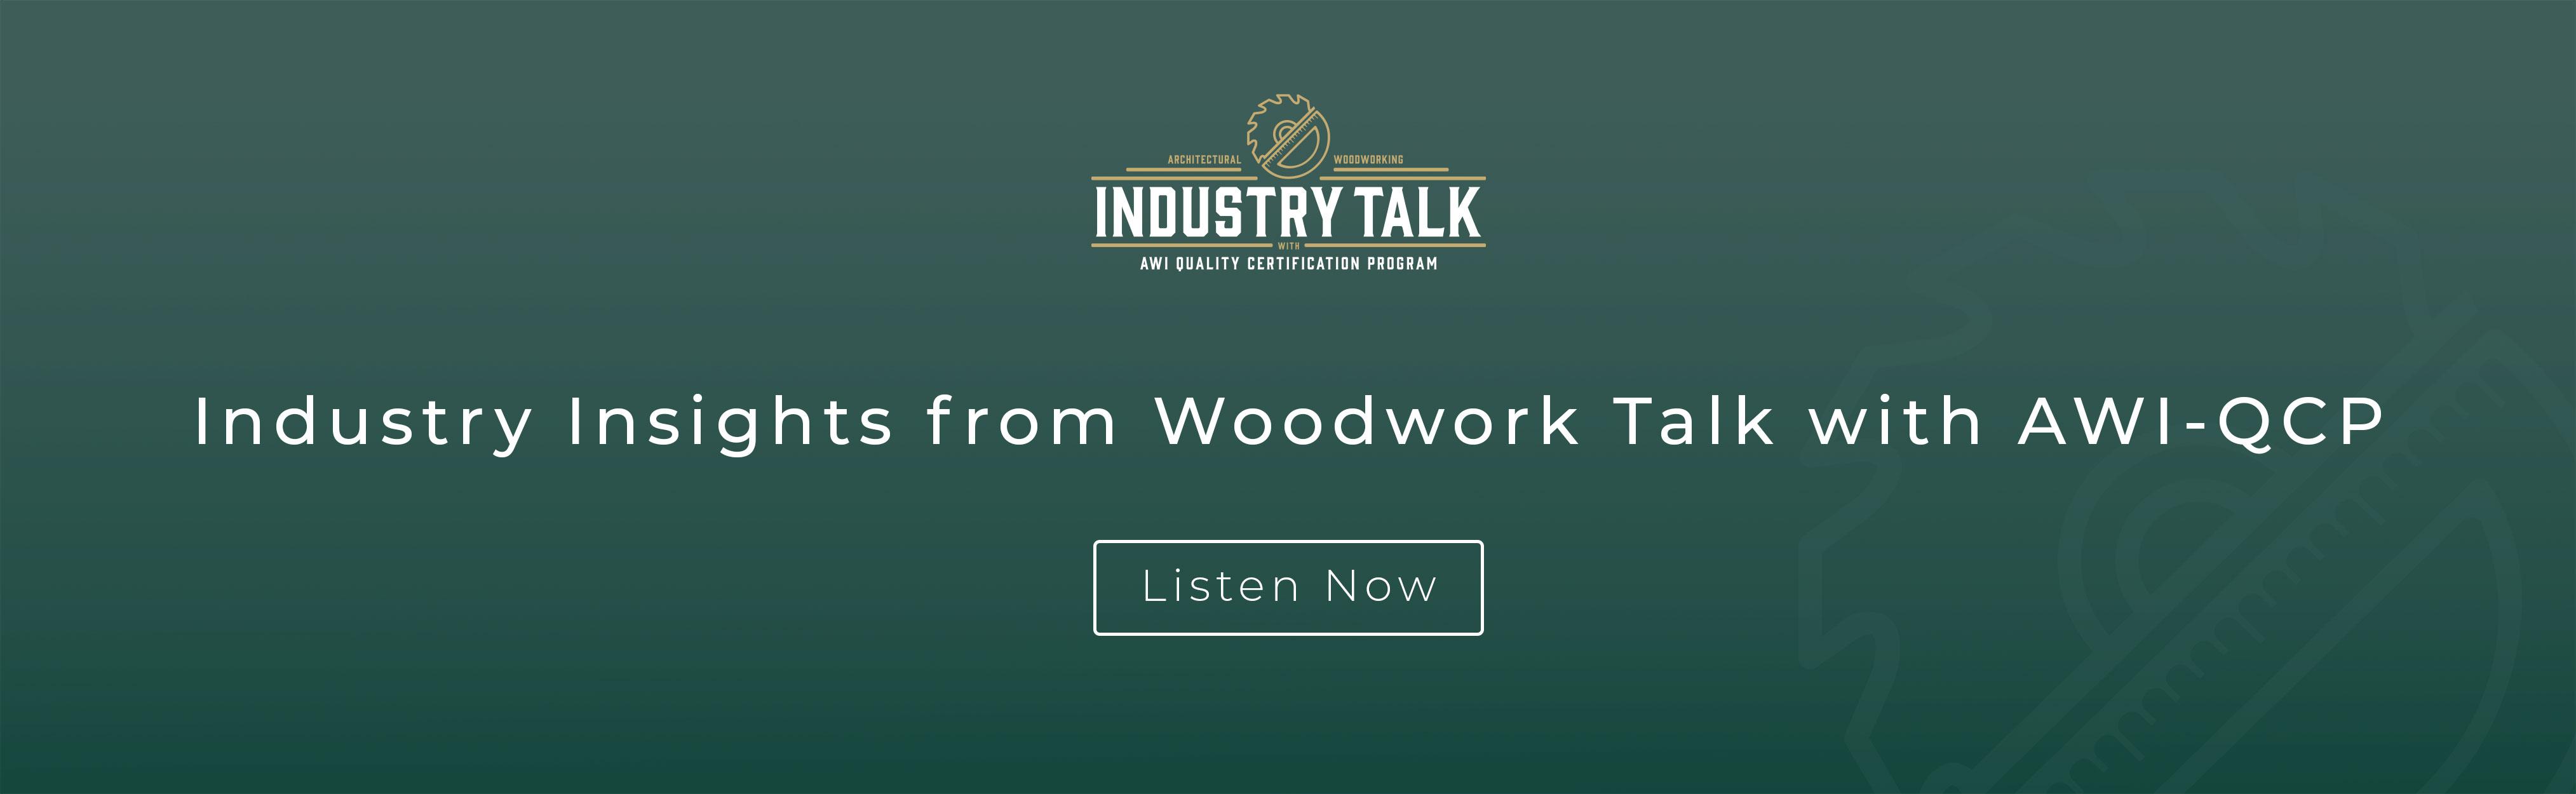 AWI QCP Industry Talk CTA